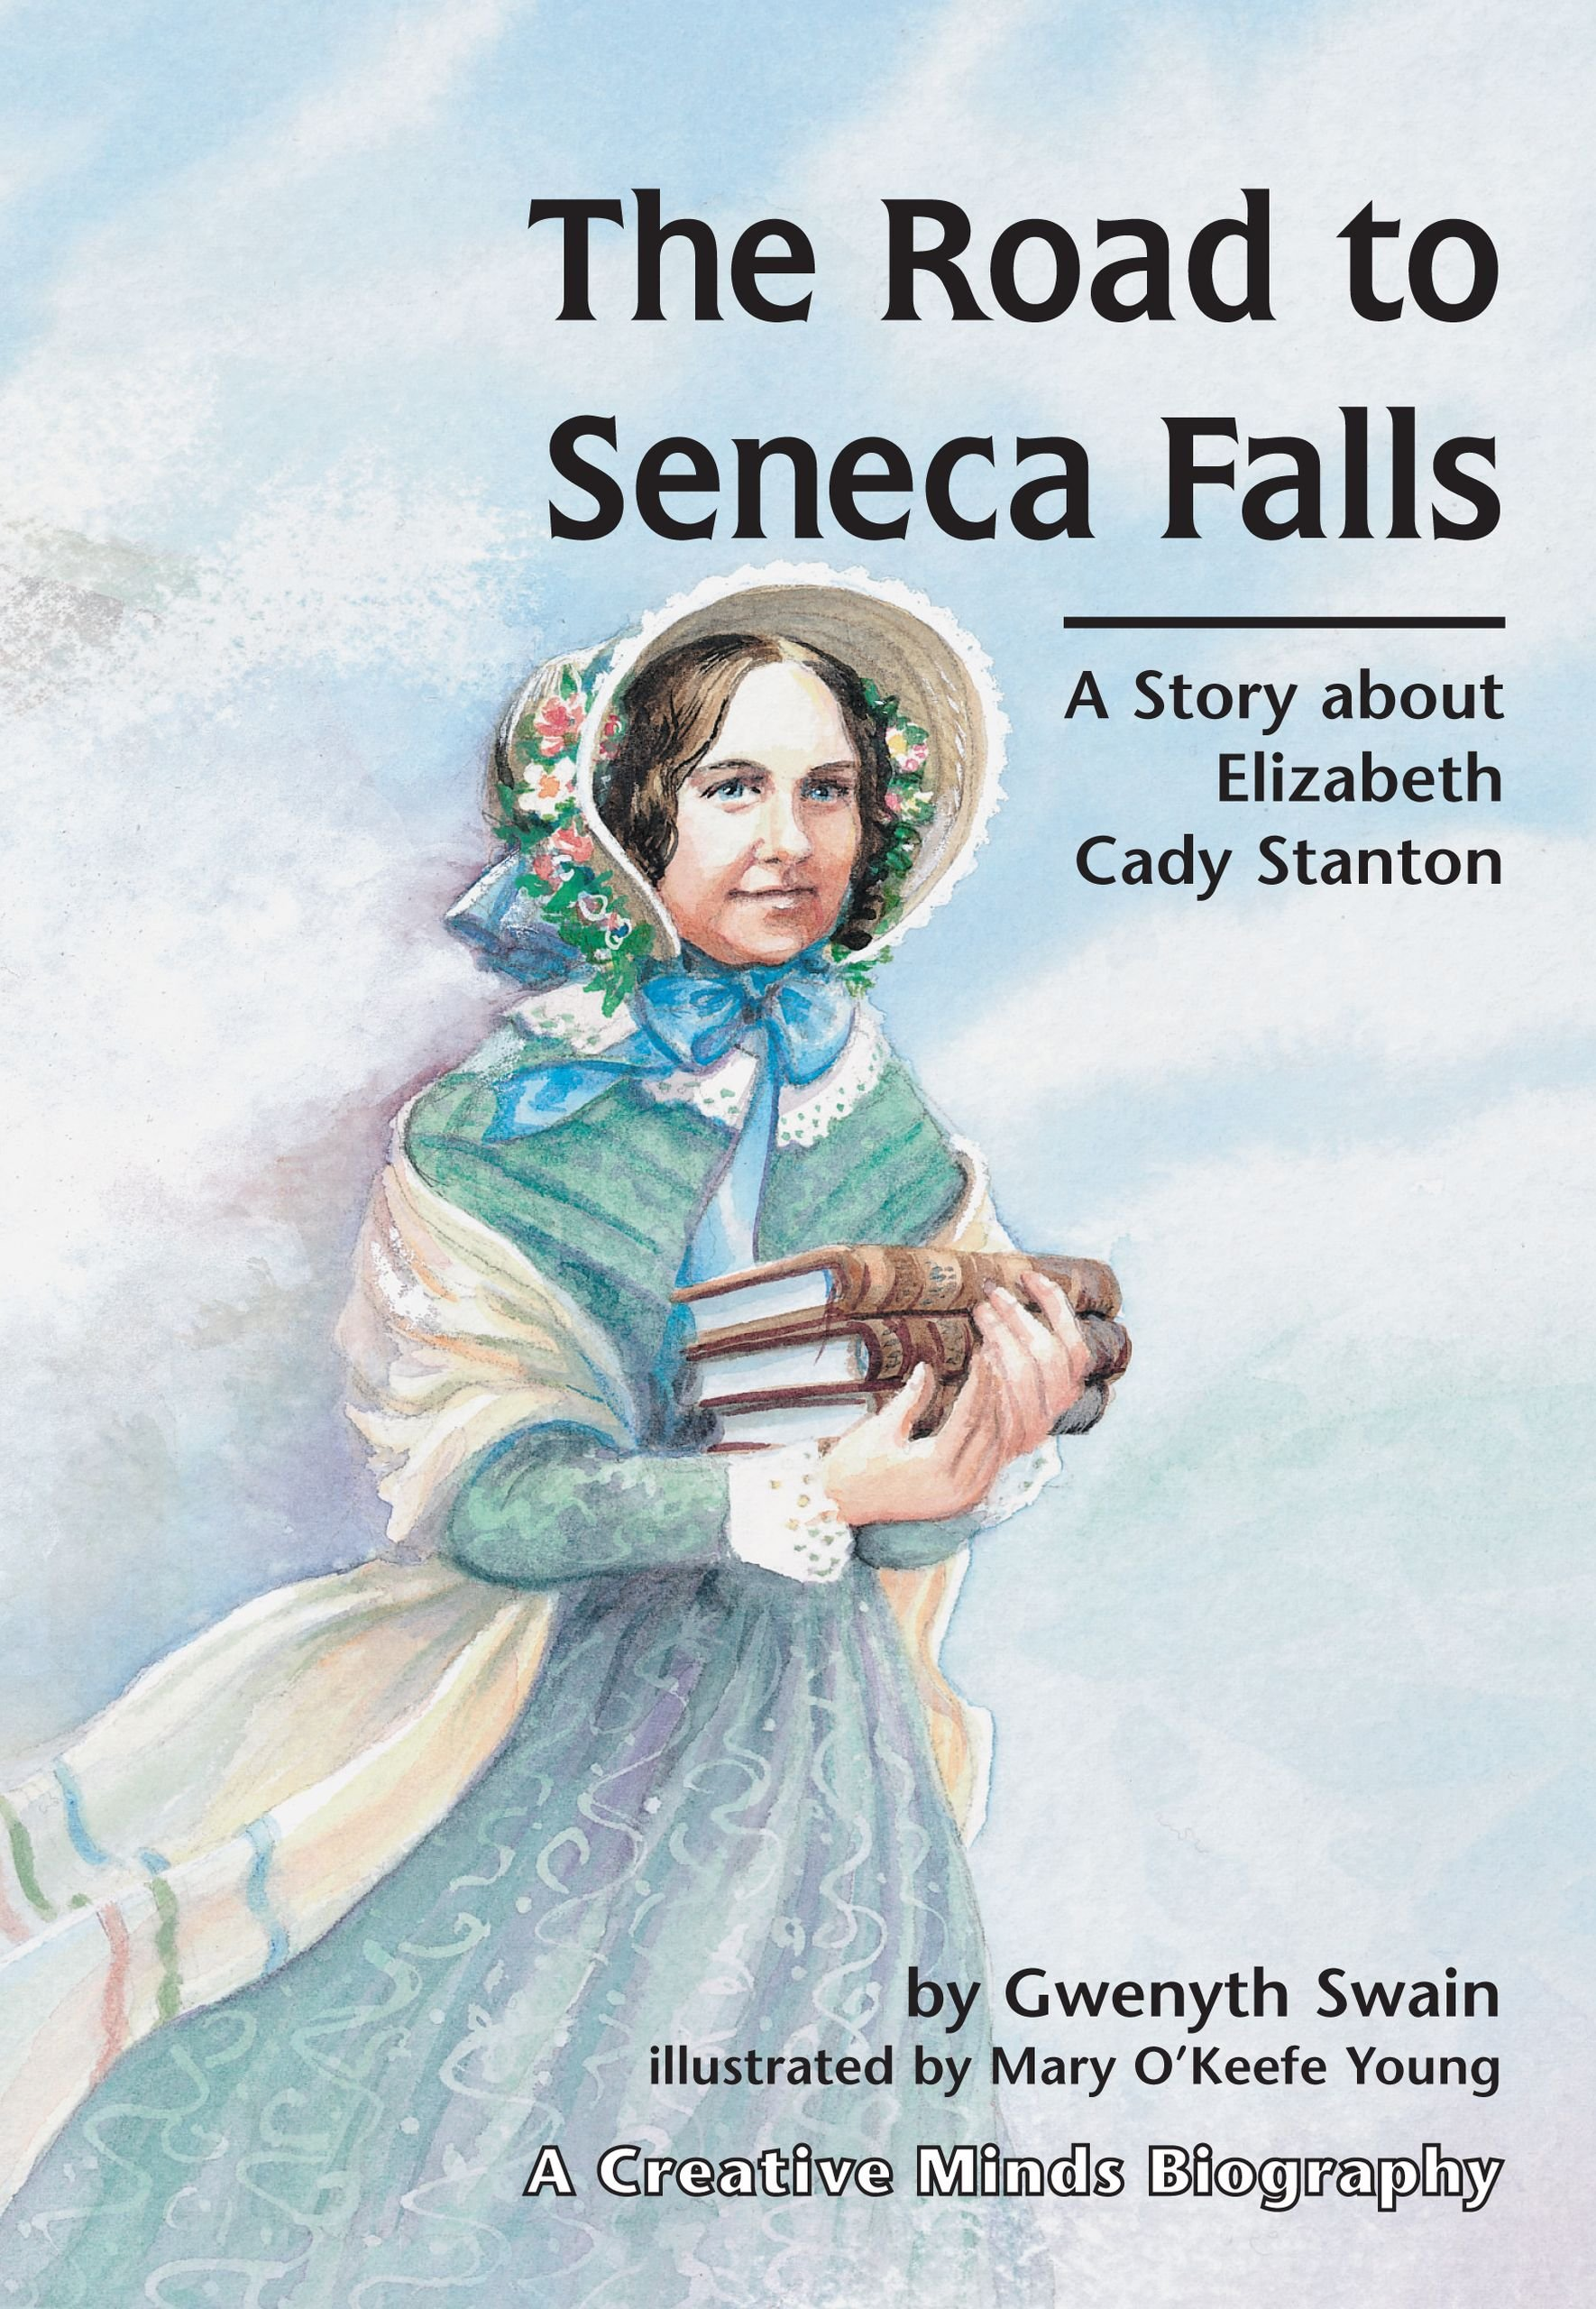 The Road to Seneca Falls (Creative Minds Biography) (Carolrhoda Creative Minds Book)